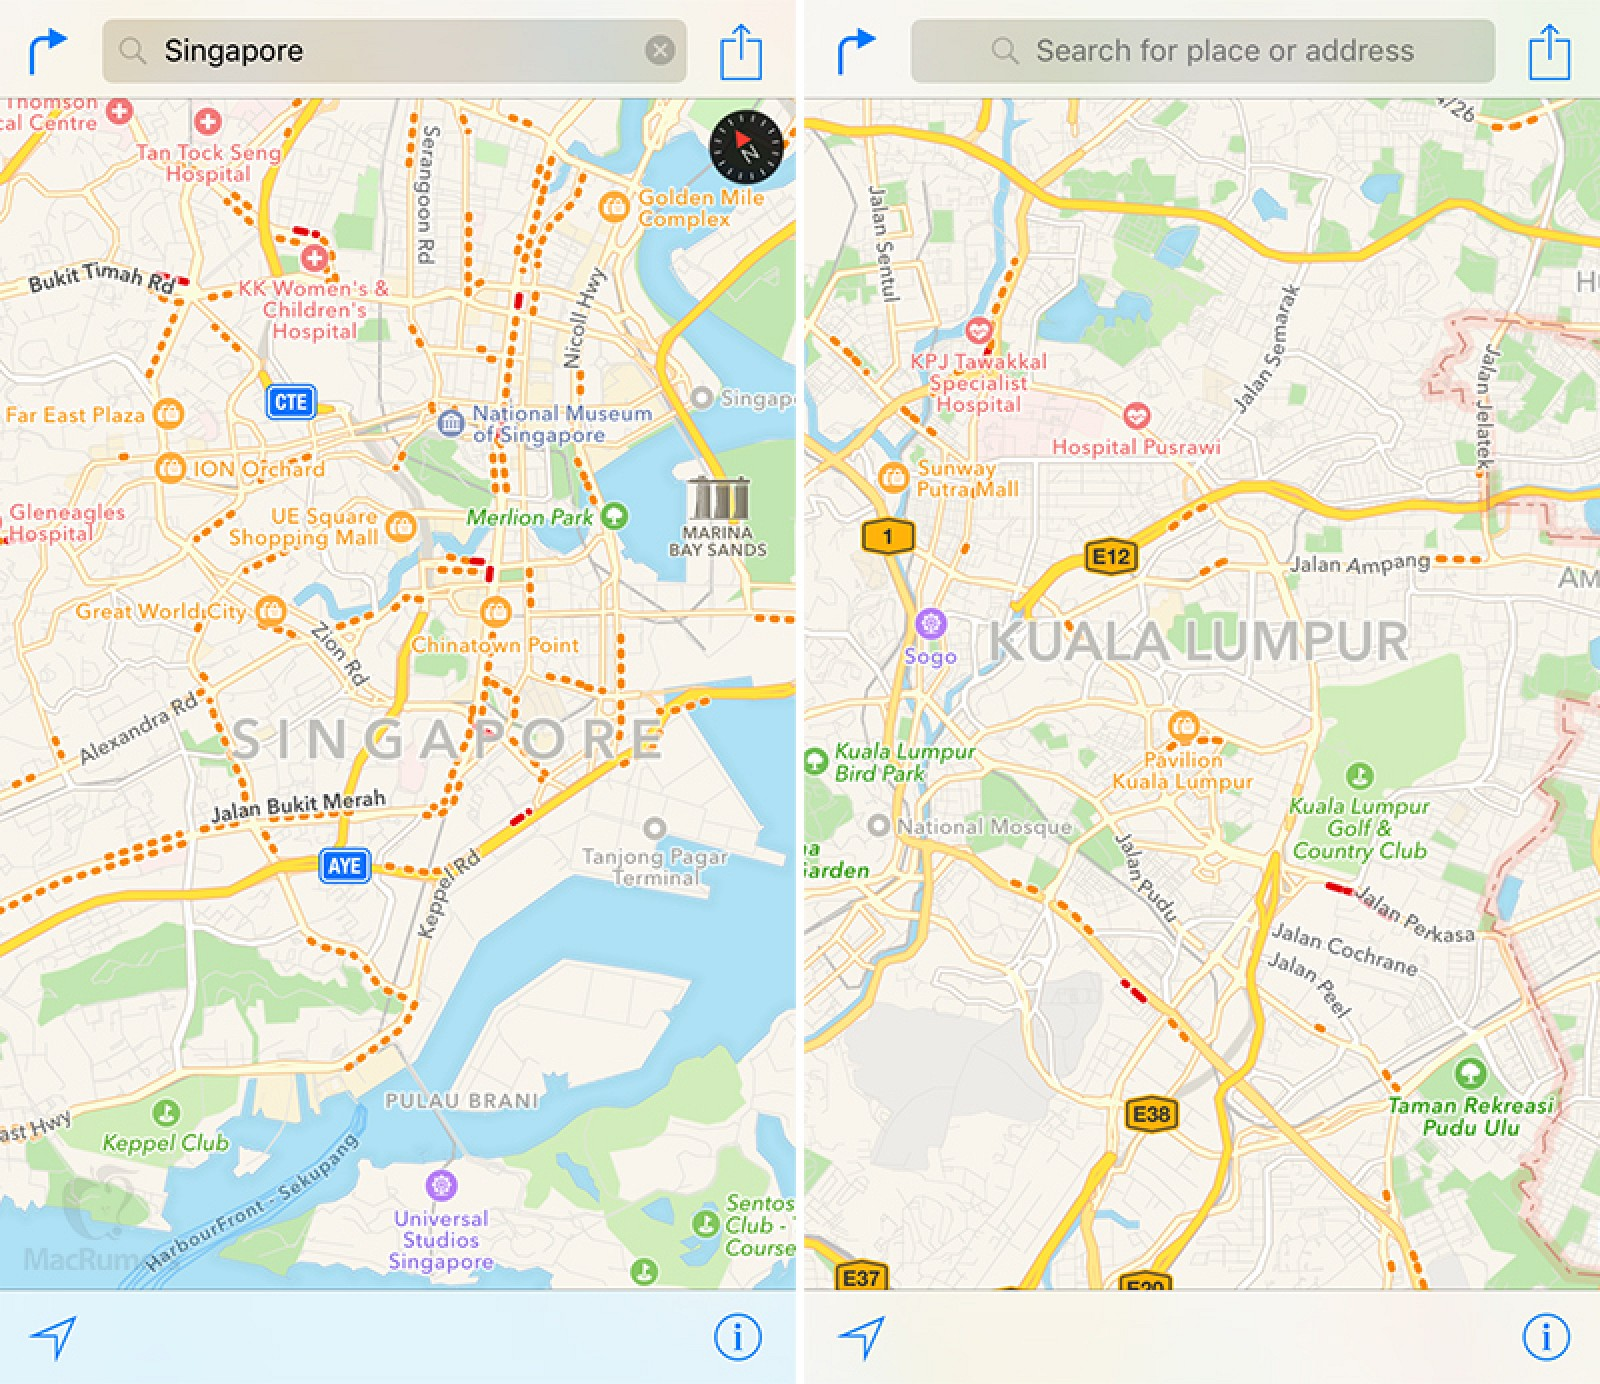 apple_maps_traffic_singapore_malaysia.jpg